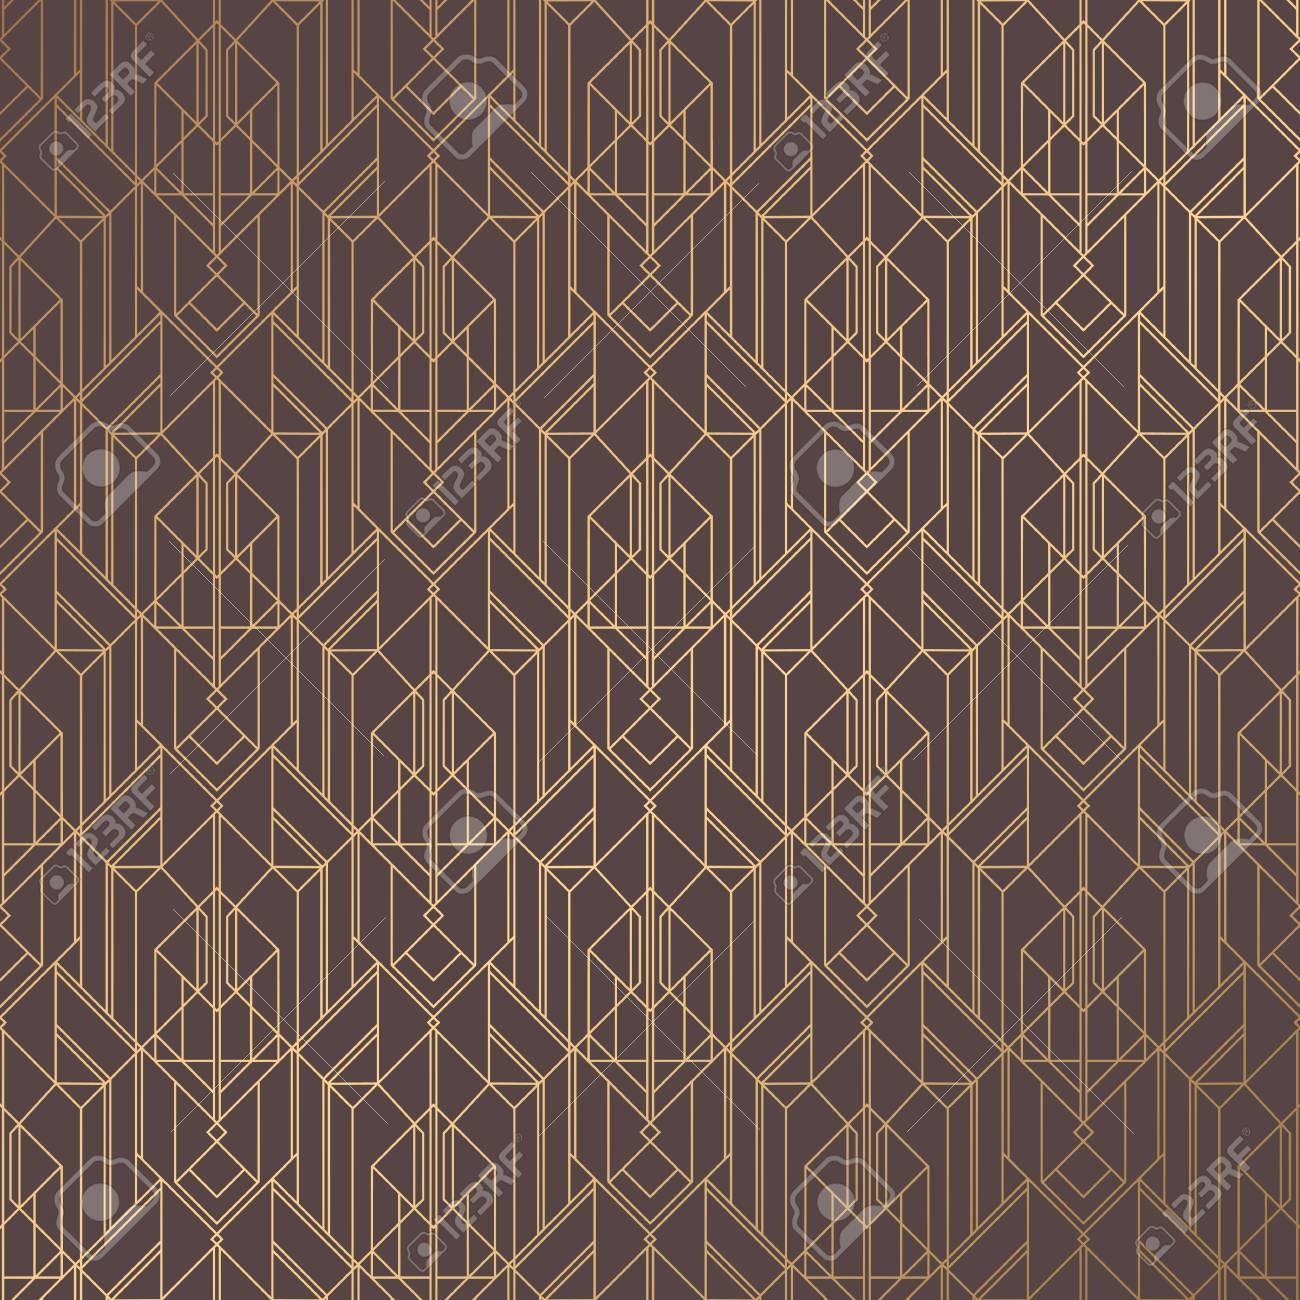 Art Deco Pattern Seamless Golden Background Minimalistic Geometric